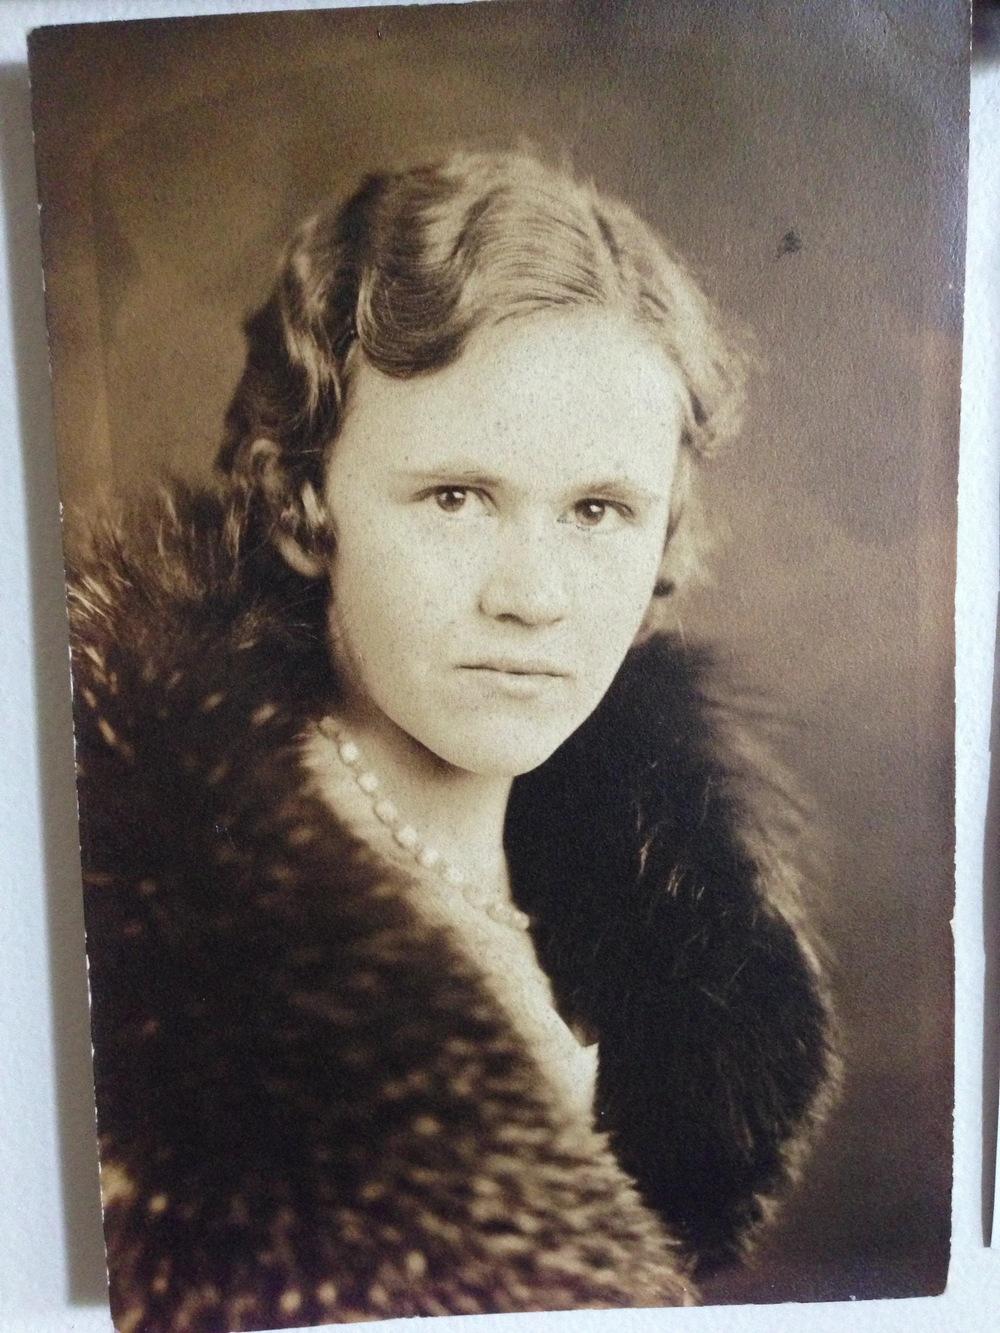 Grandma Sholly